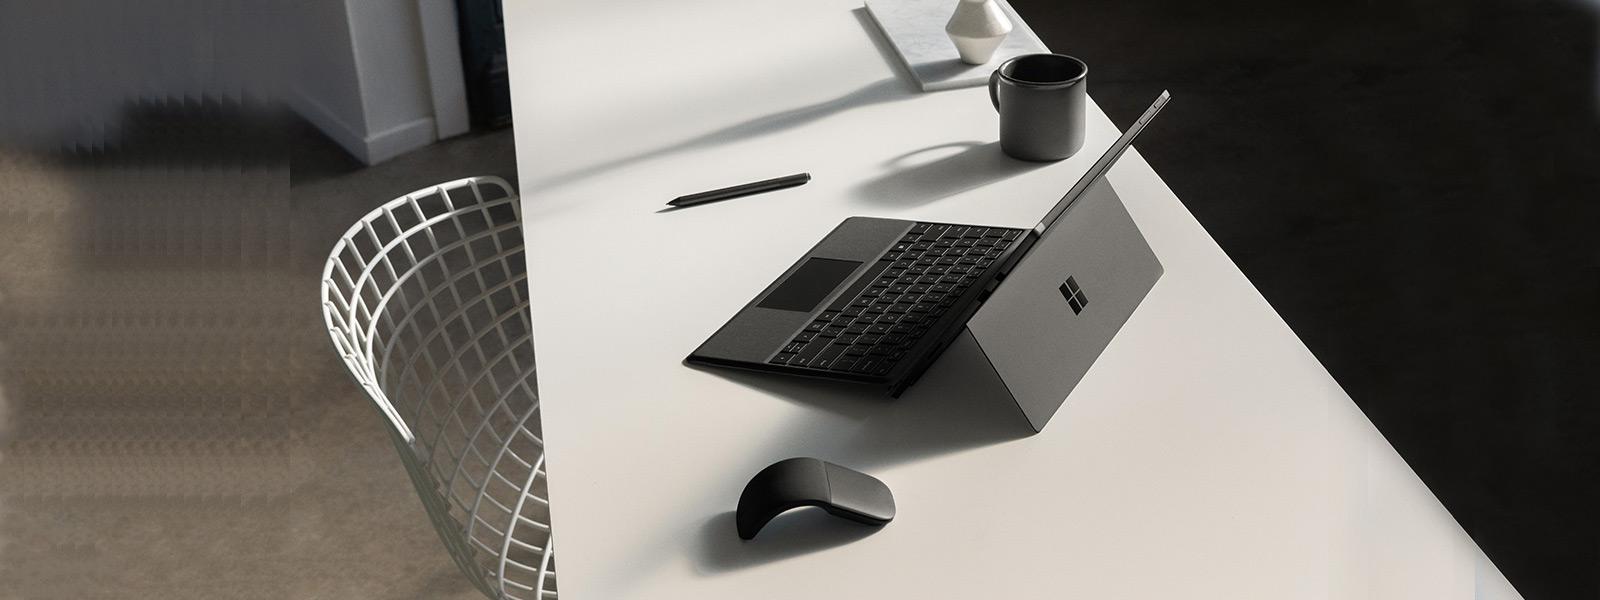 Surface Pro 6 op een bureautafel in laptopmodus met Surface Pro Type Cover, Surface-pen en Surface Arc Mouse